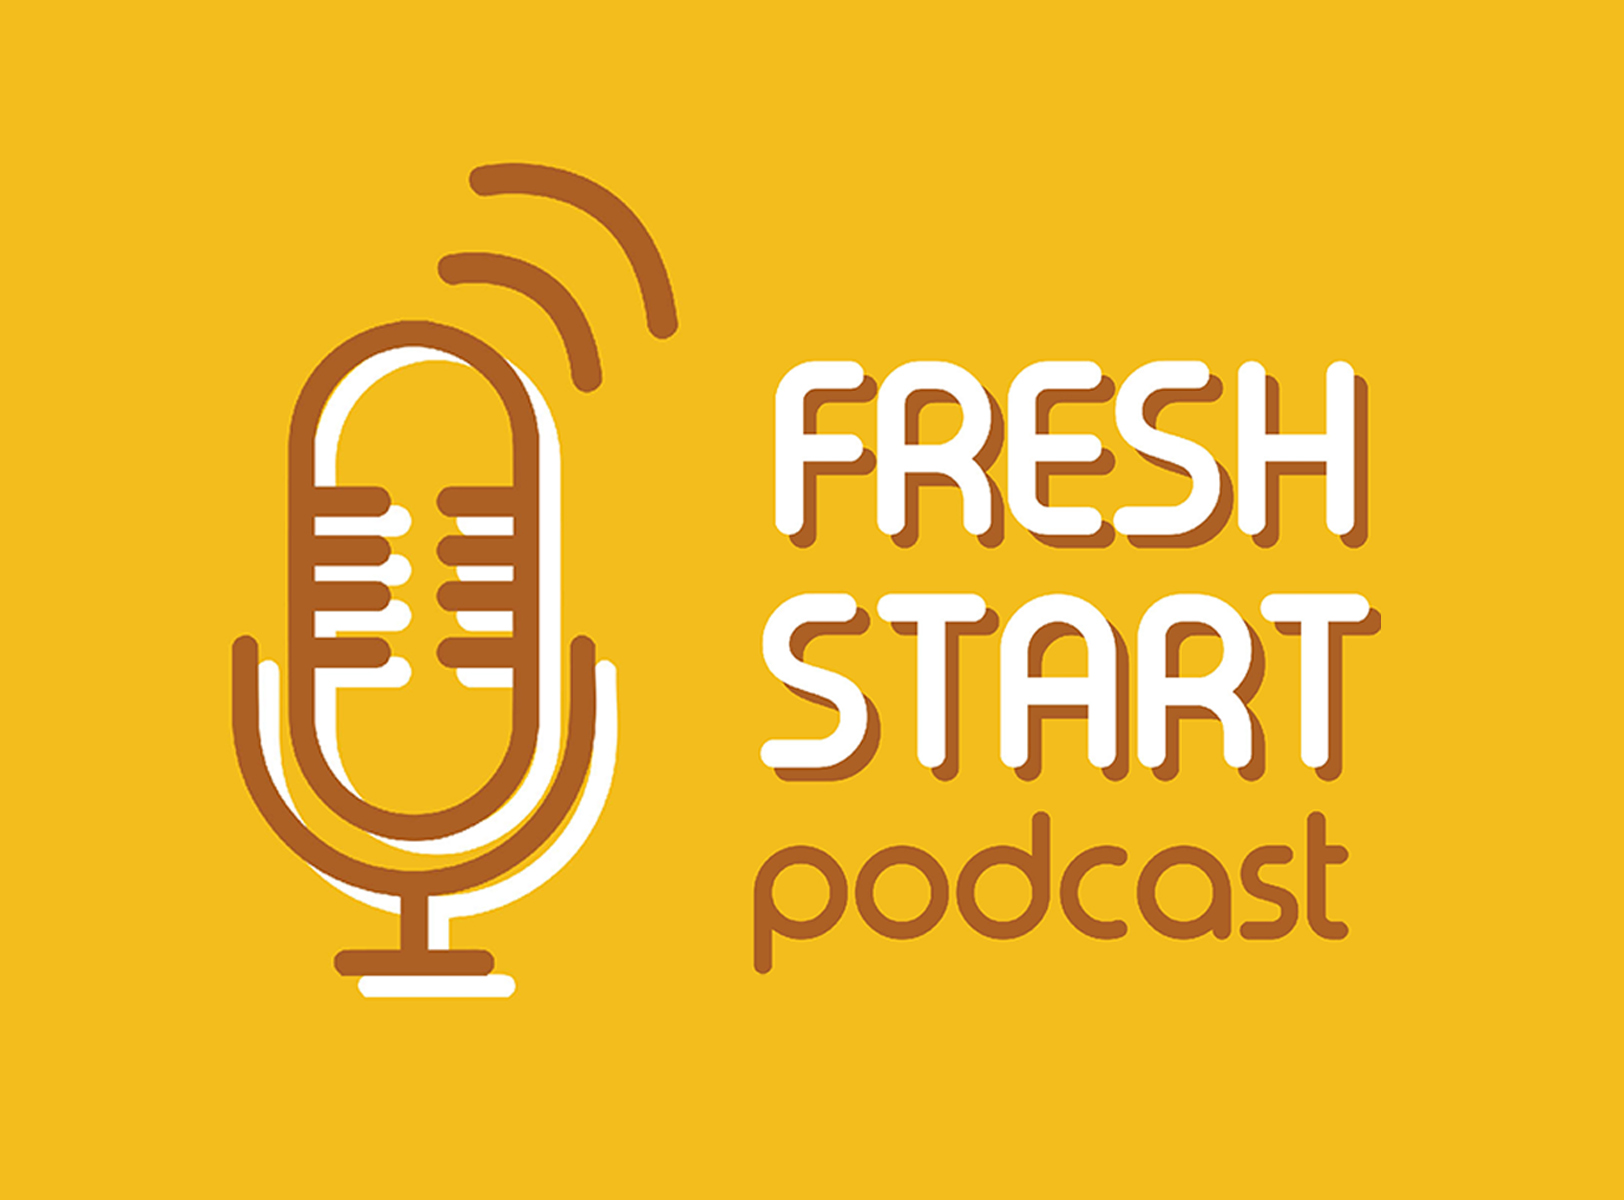 Fresh Start: Podcast News (5/20/2019 Mon.)